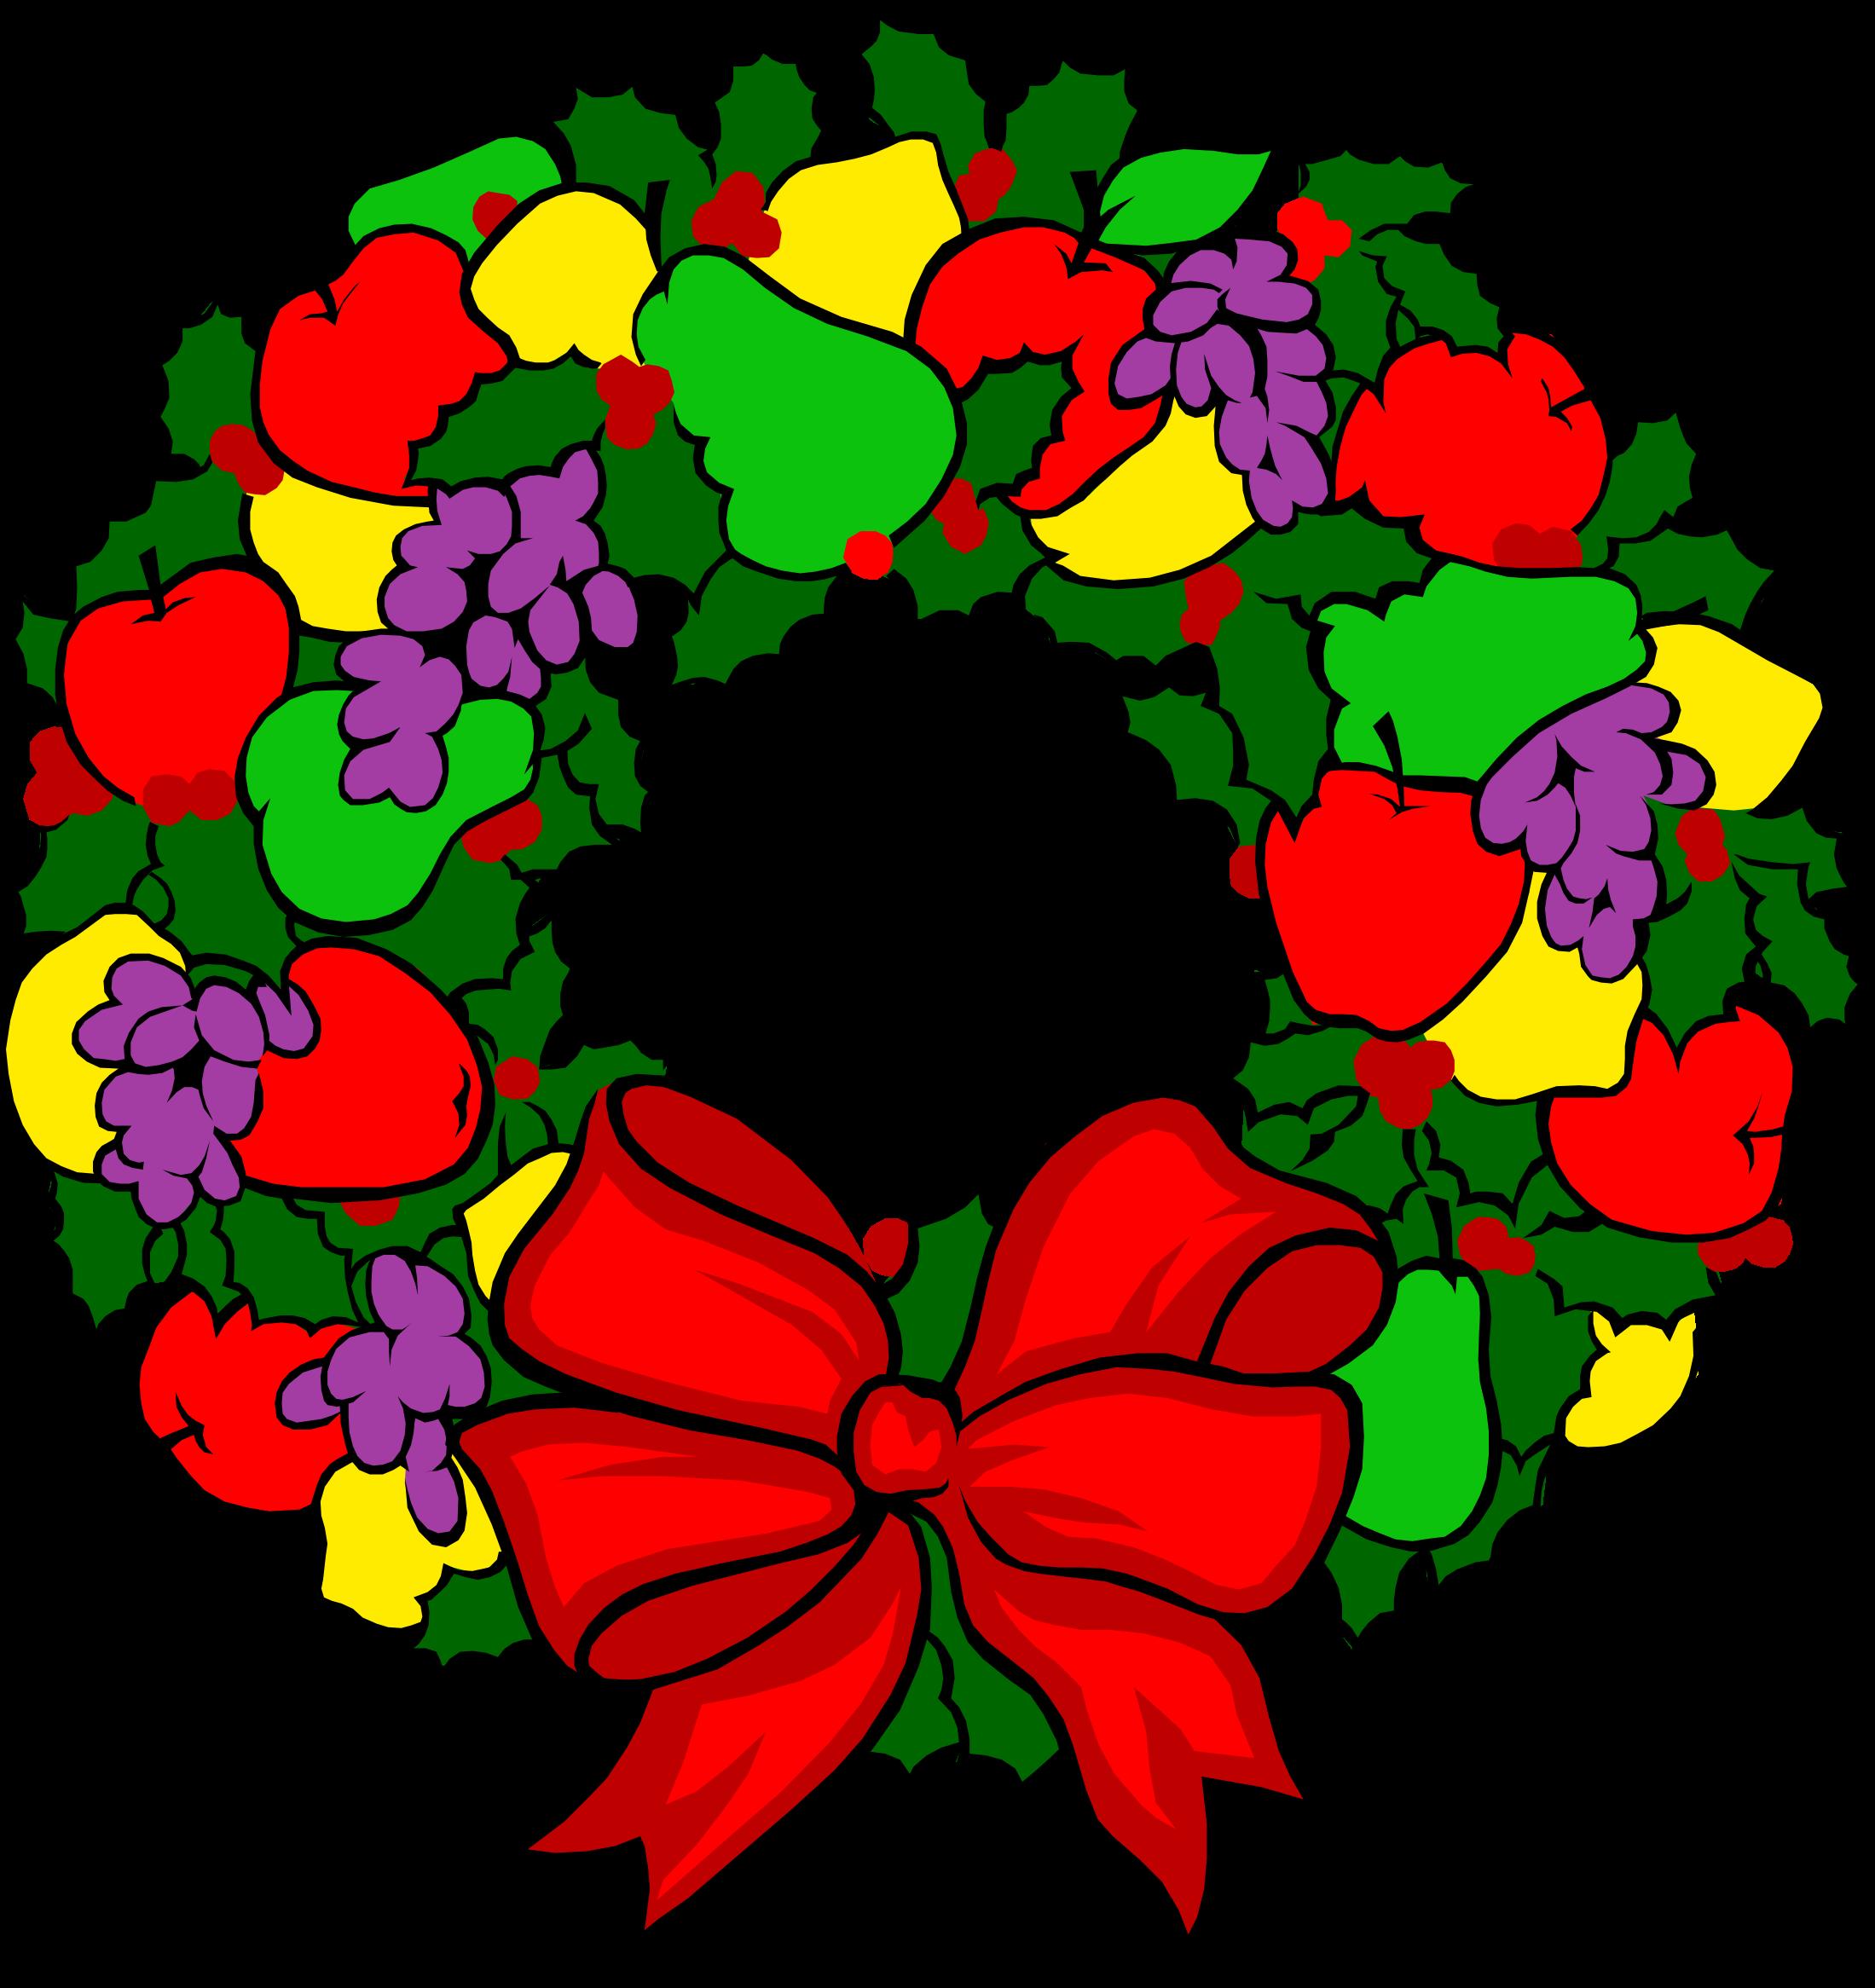 Colorful wreath big image. Floral clipart cactus